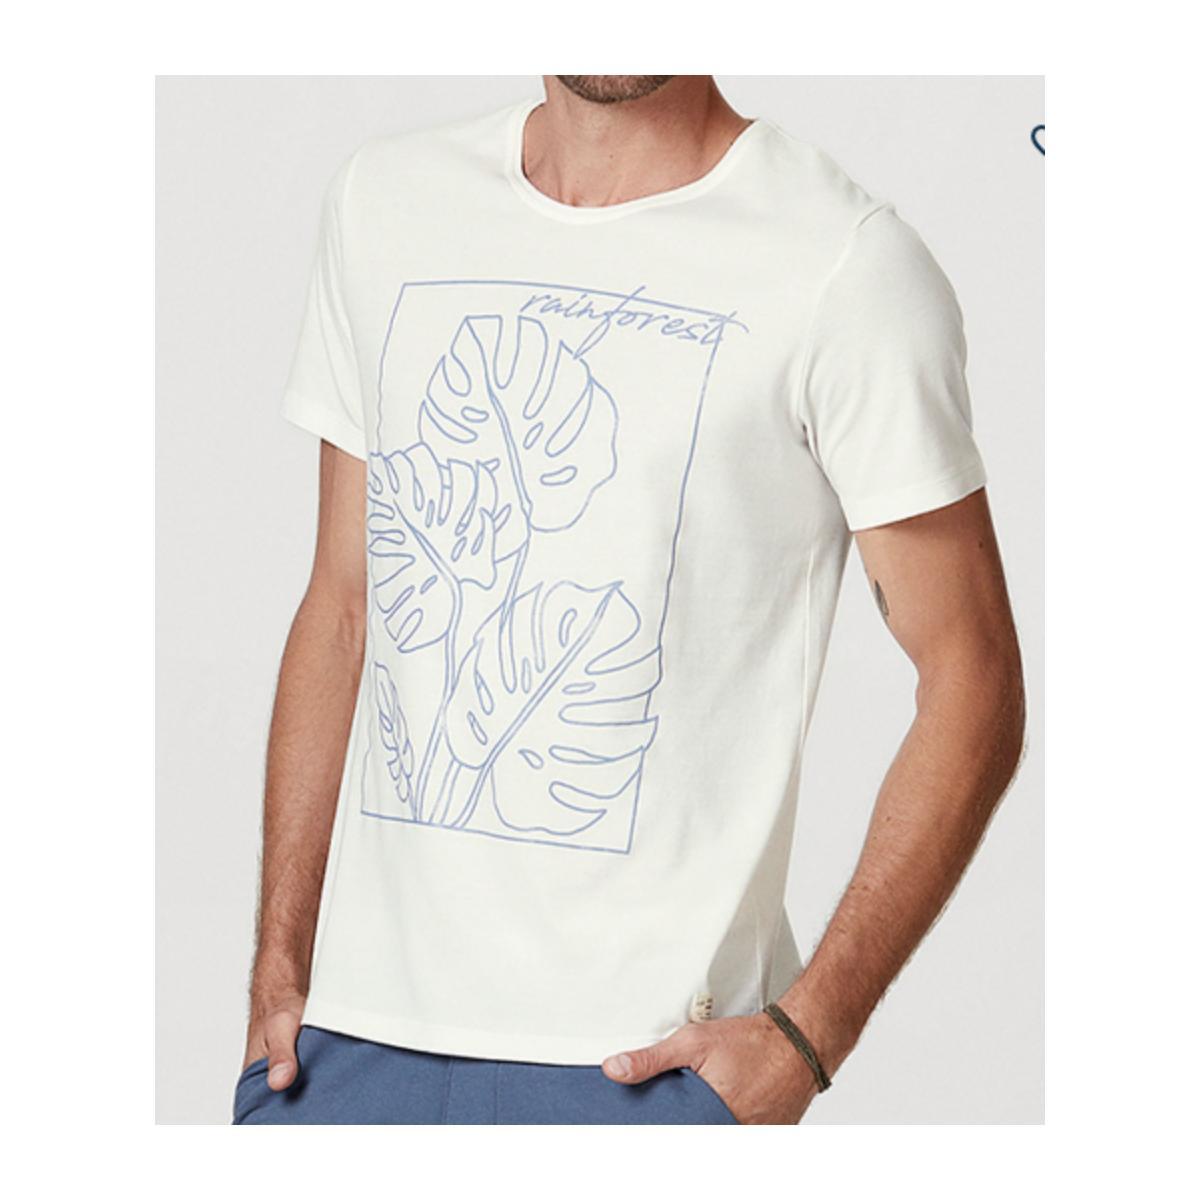 Camiseta Masculina Hering 4efz Nmcen Branco